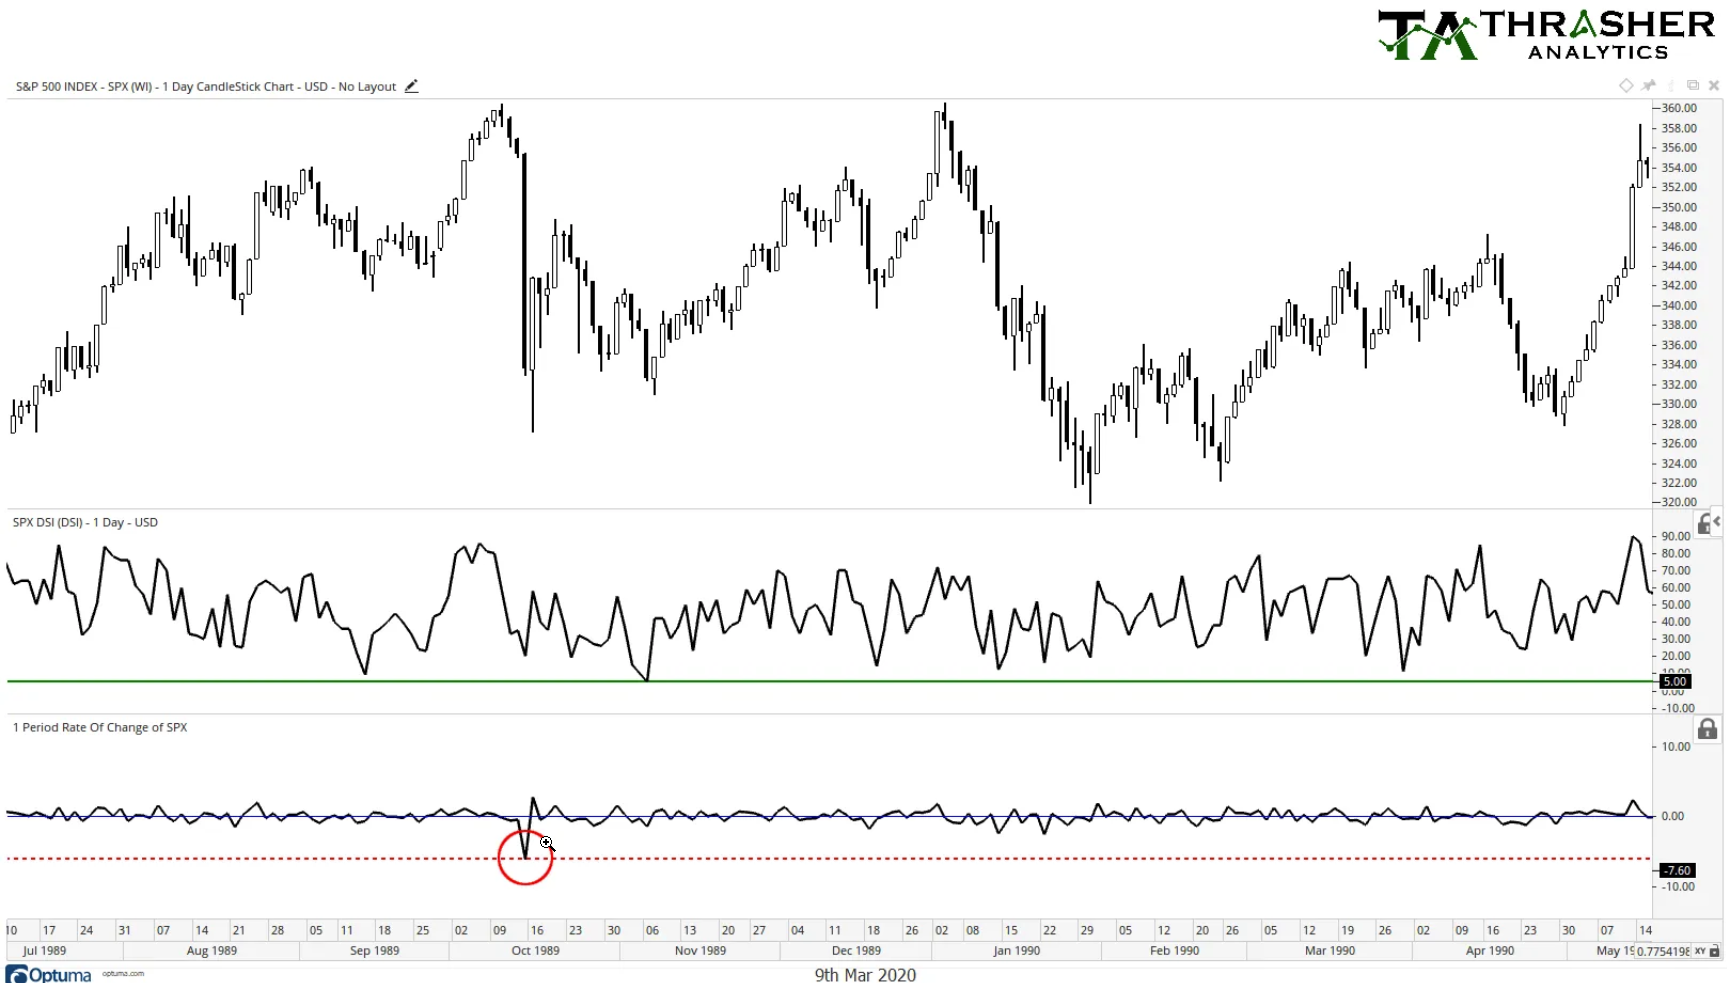 S&P 500: 1989